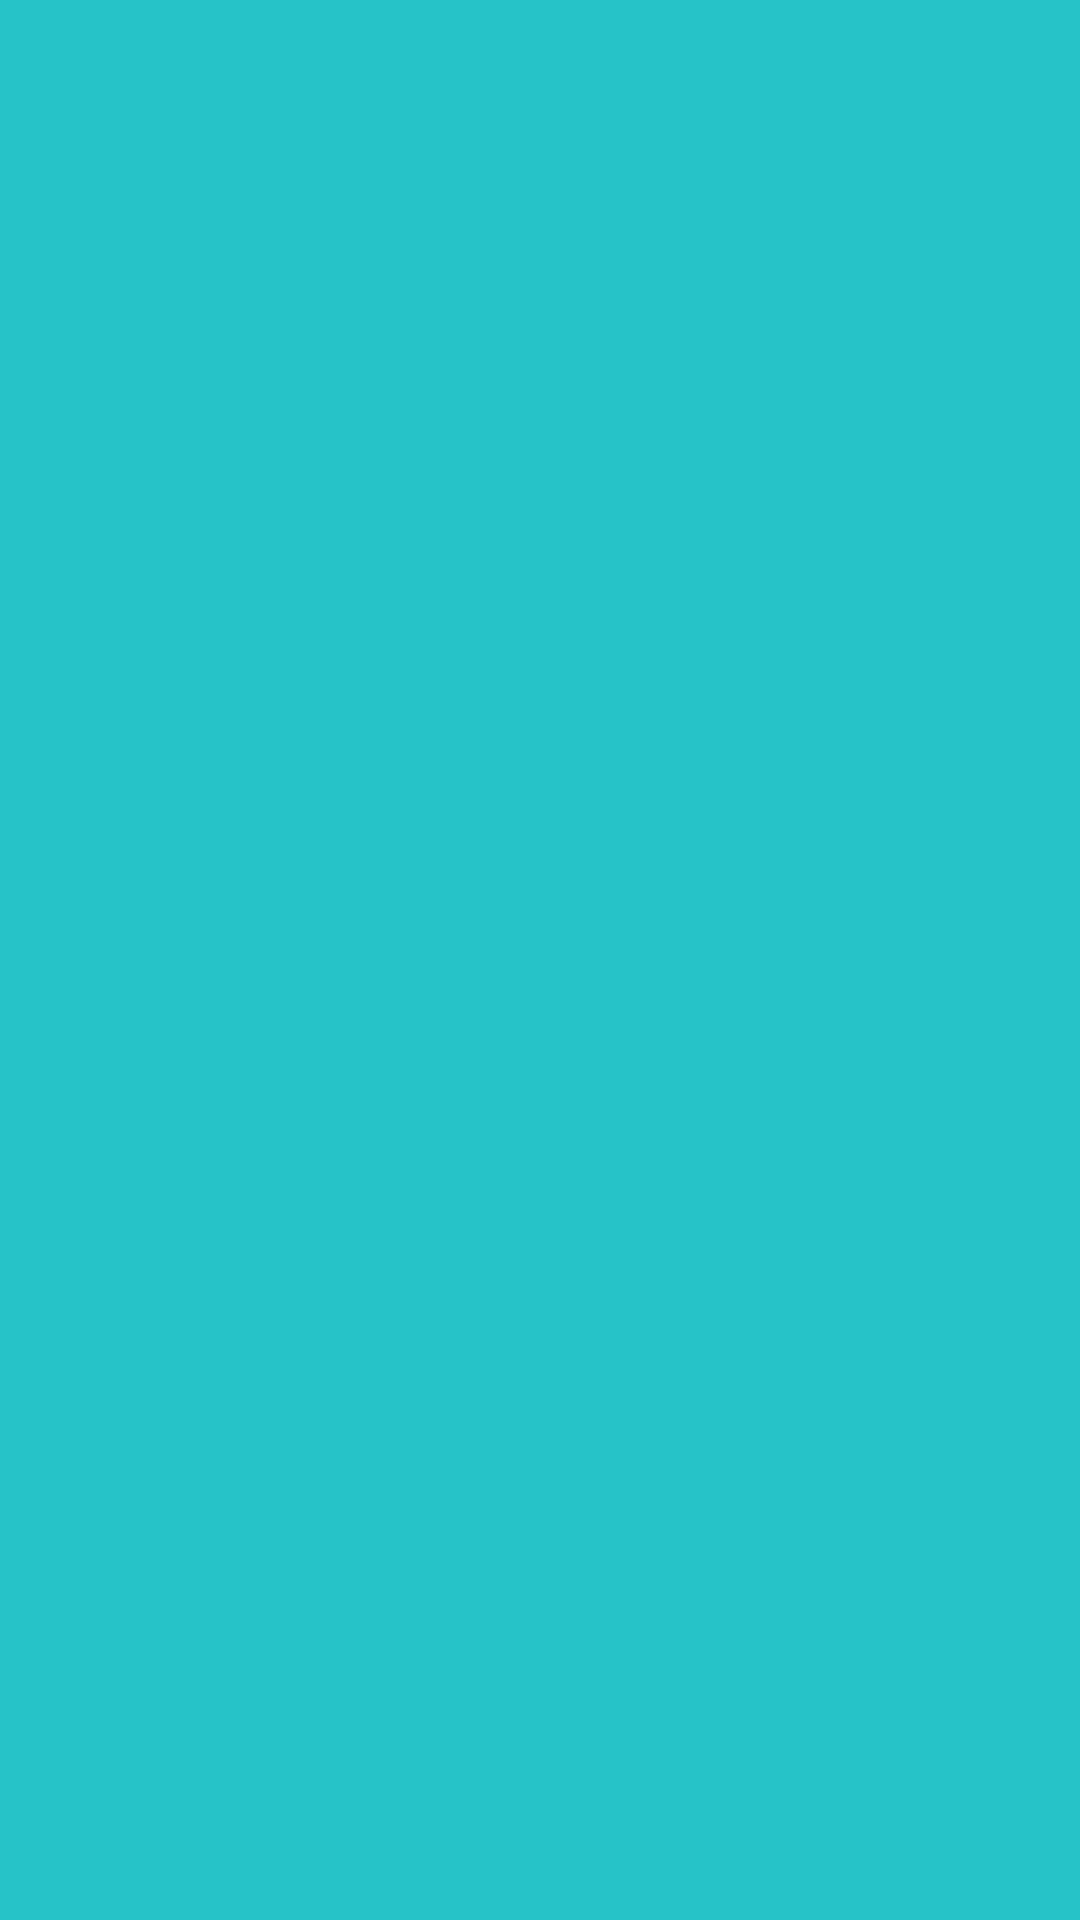 26c3c8 solid color image httpssolidcolore26c3c8m hd mobile and desktop wallpaper voltagebd Images